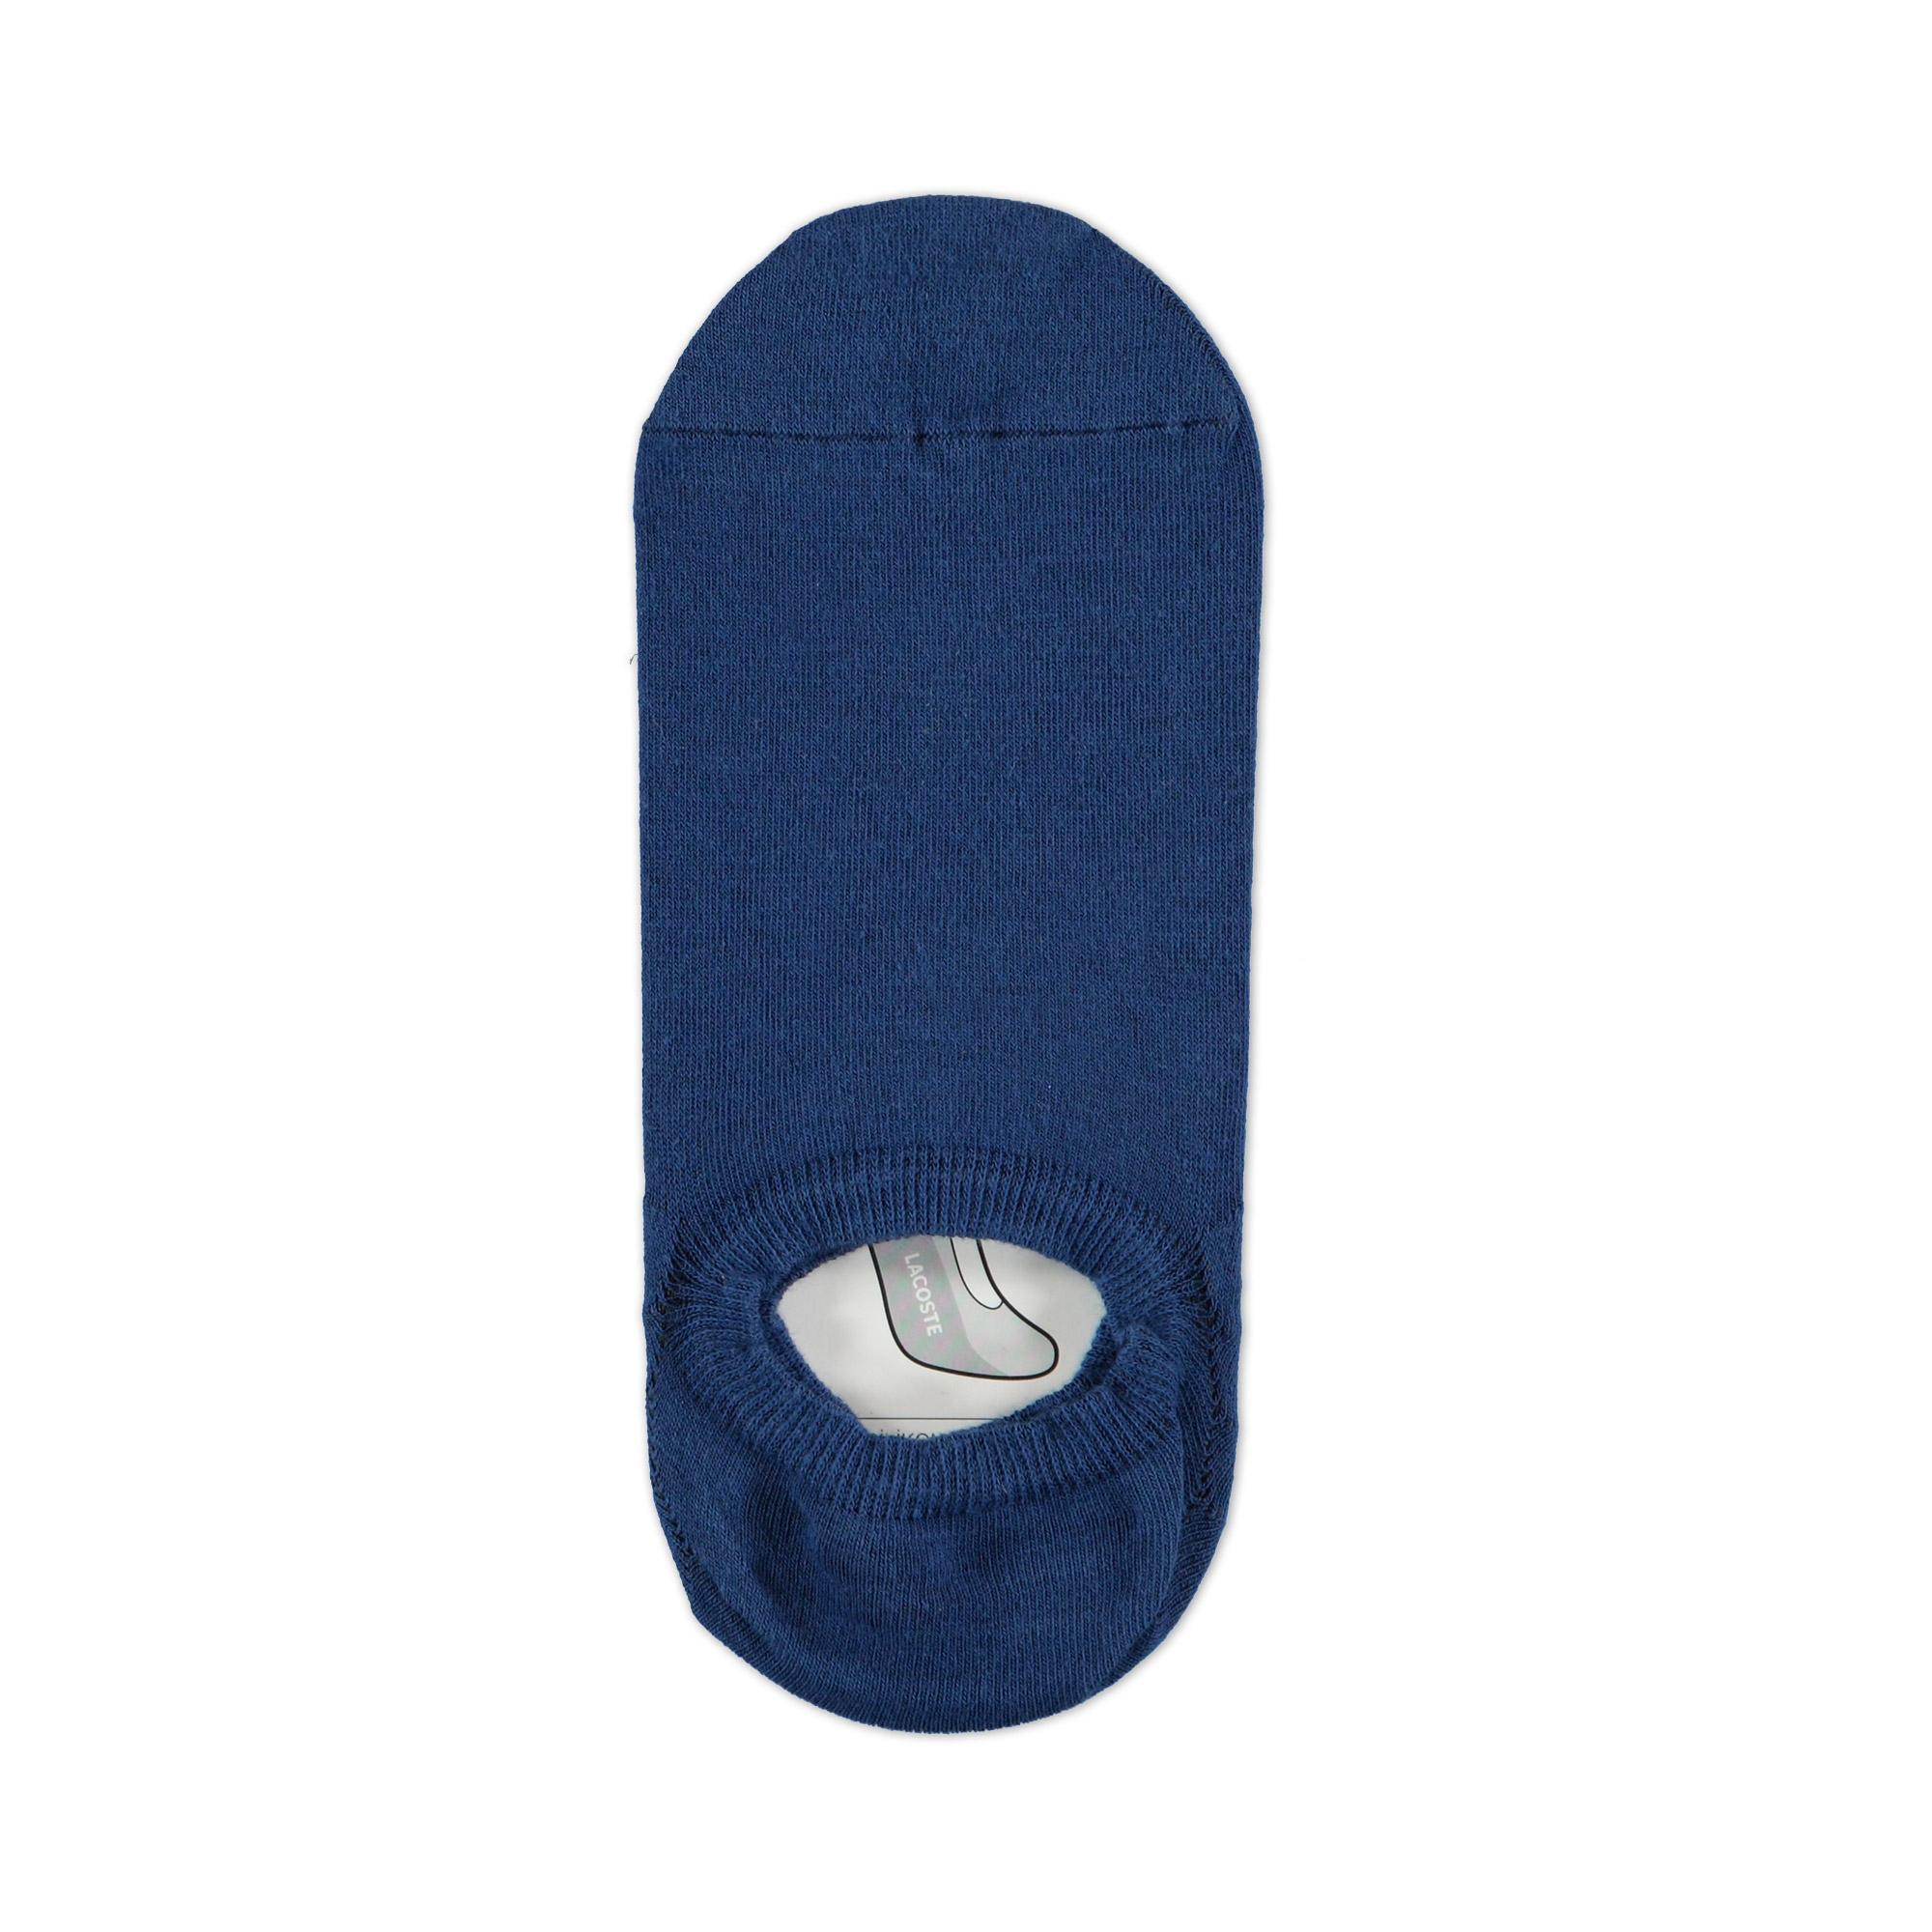 Lacoste Unisex Mavi Çorap